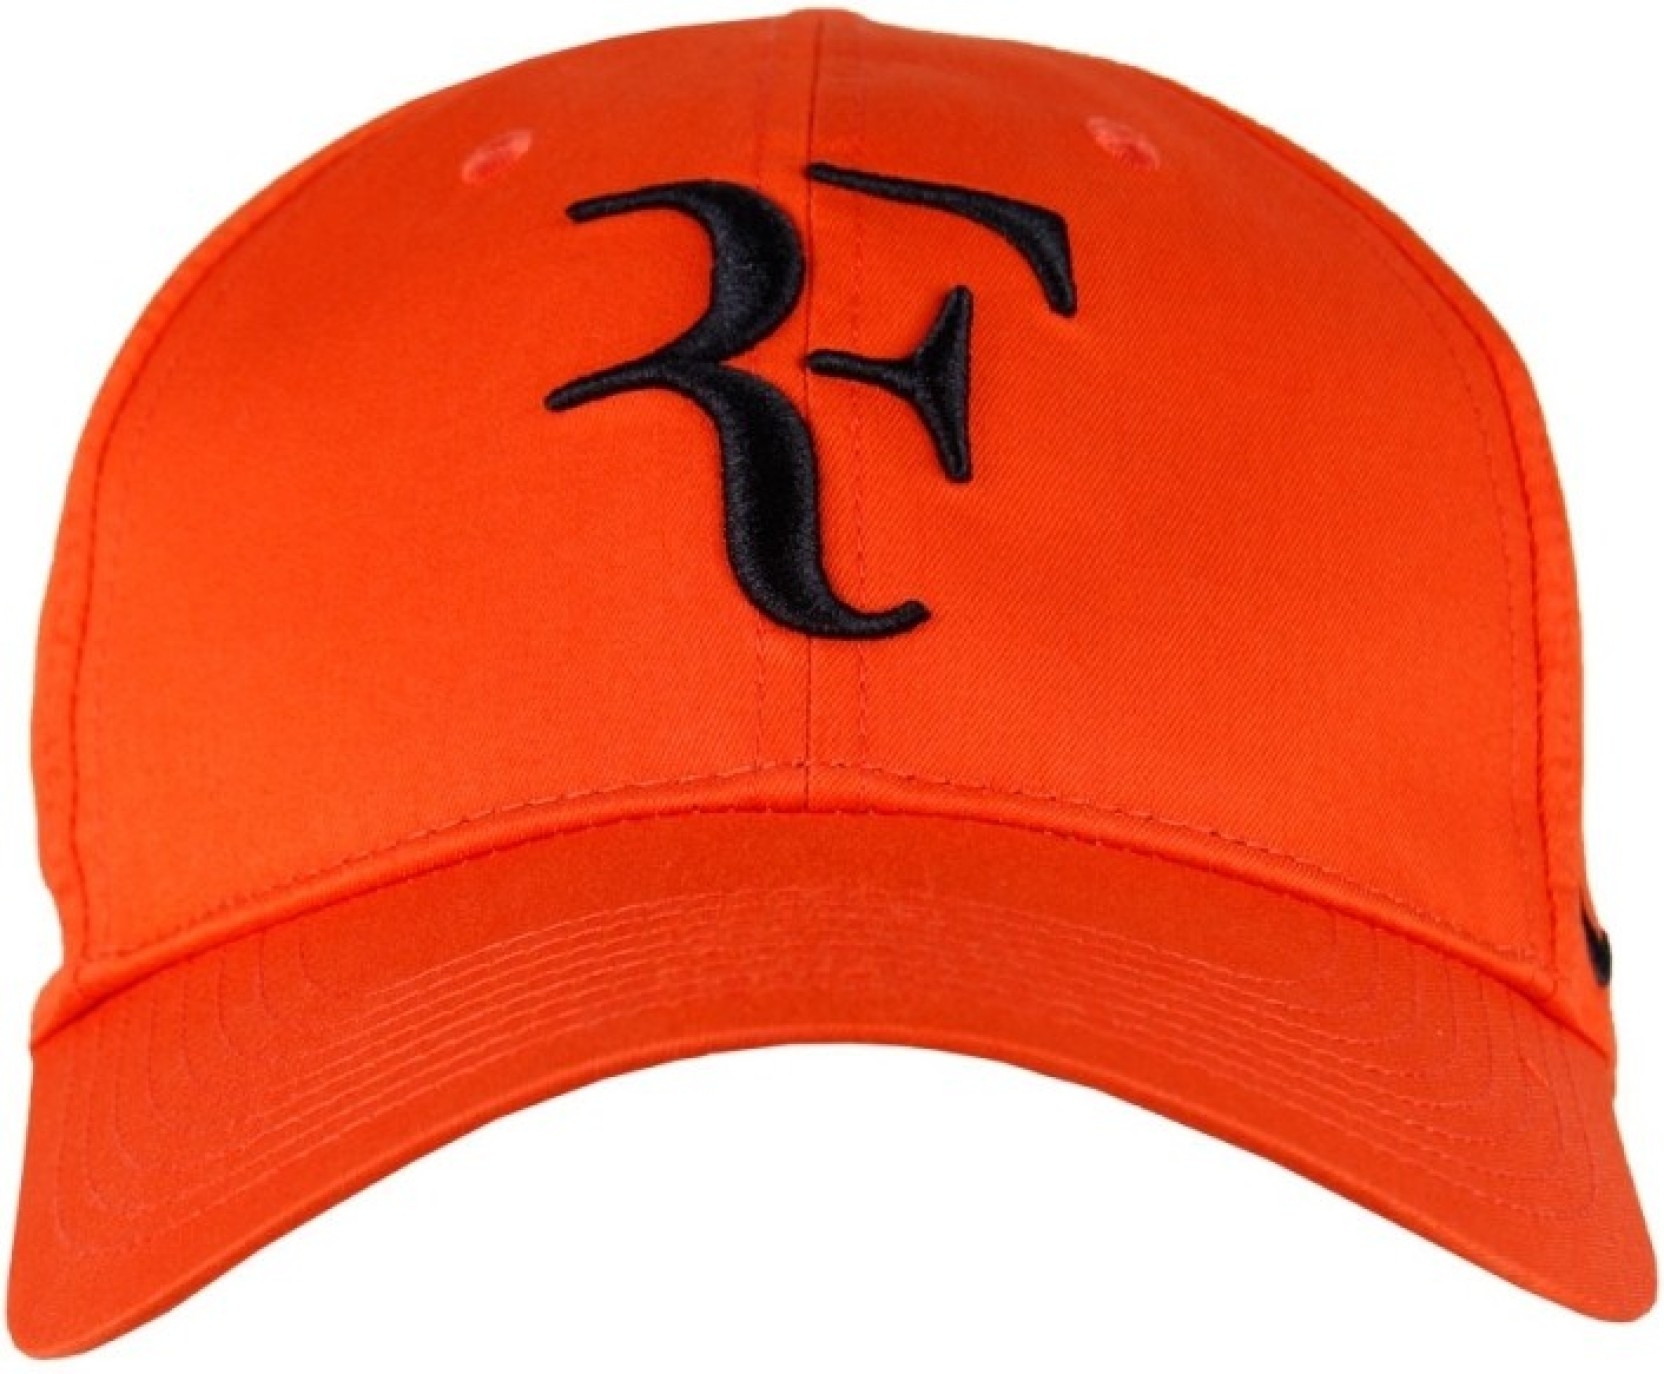 Nike Roger Federer Unisex Solid Tennis Cap Buy Orange